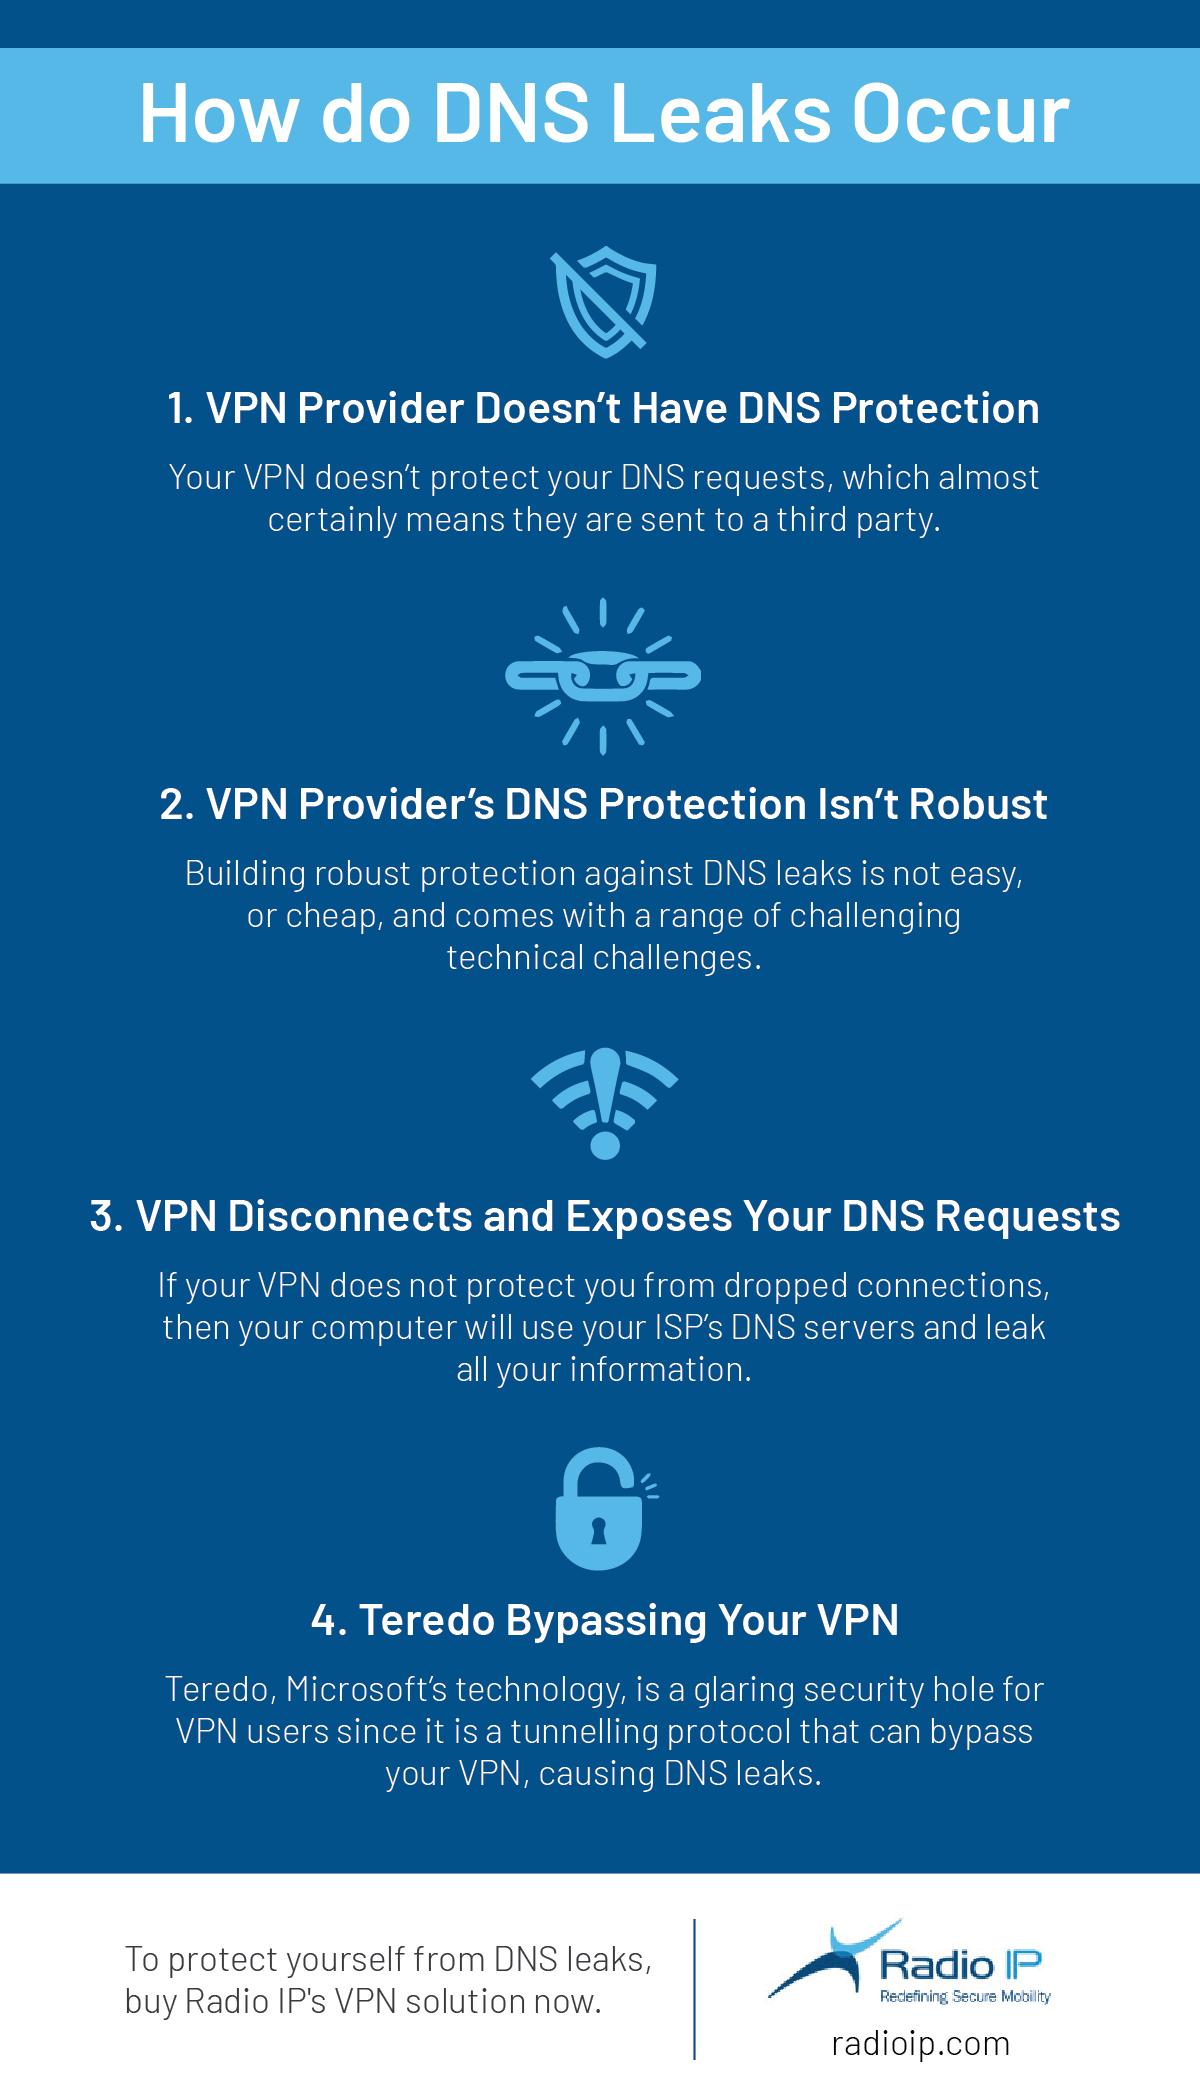 How Do DNS Leaks Occur